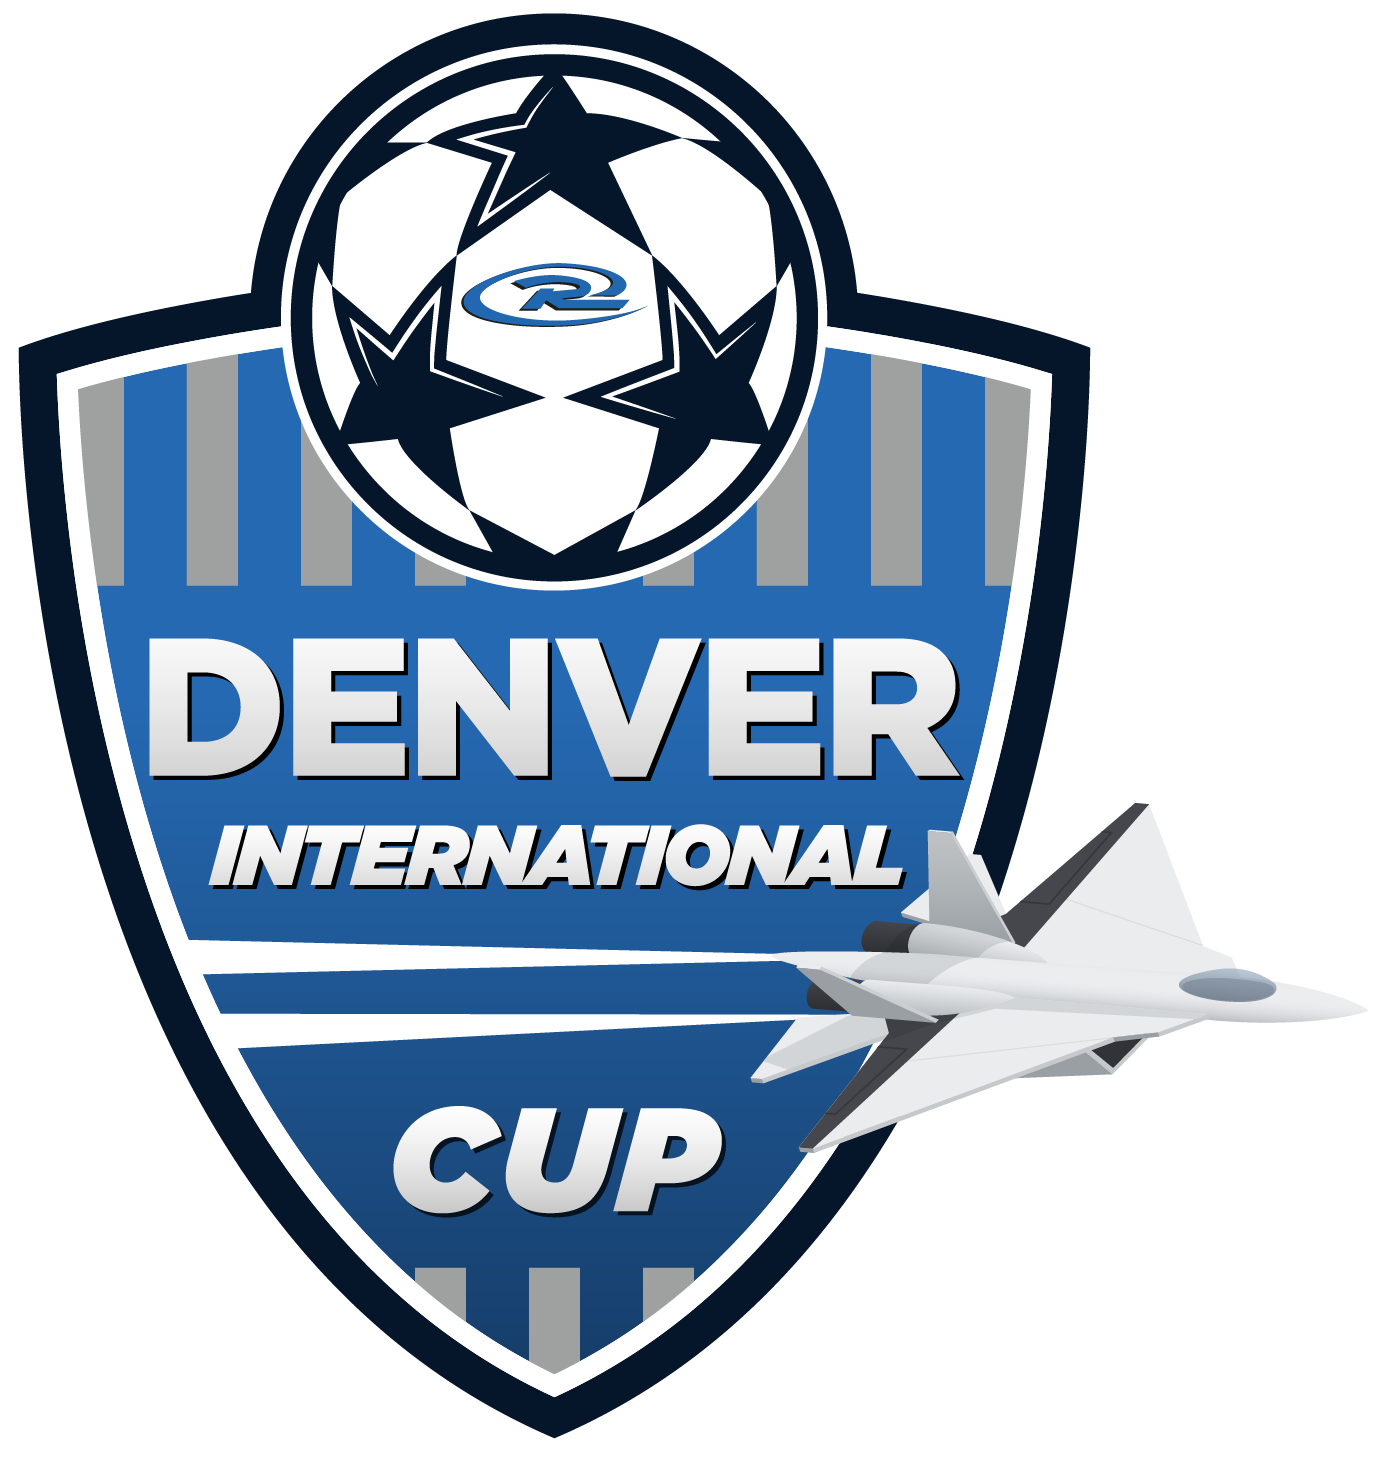 Denver-International-Cup